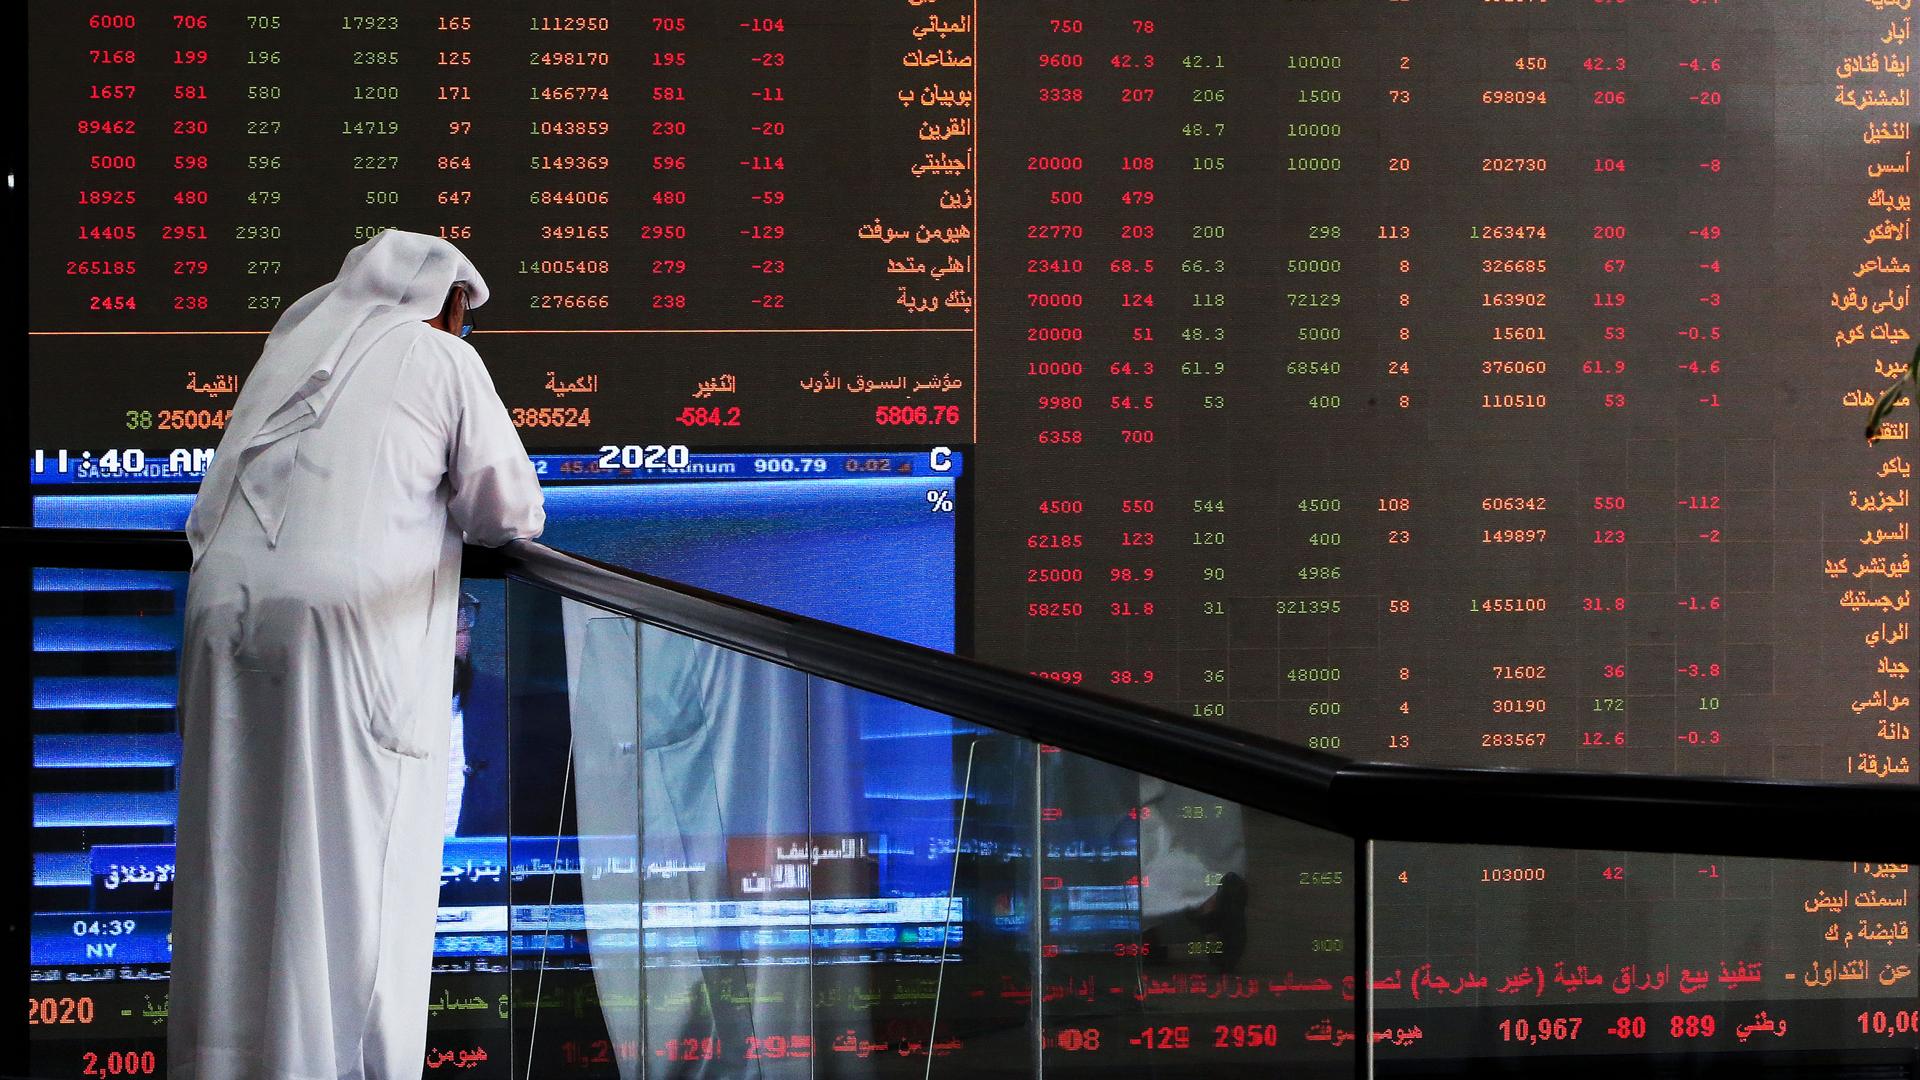 A Kuwaiti trader checks stock prices at Boursa Kuwait in Kuwait City, on March 8, 2020. (Credit: Yasser-Asser Al-Zayyat/AFP/Getty Images)